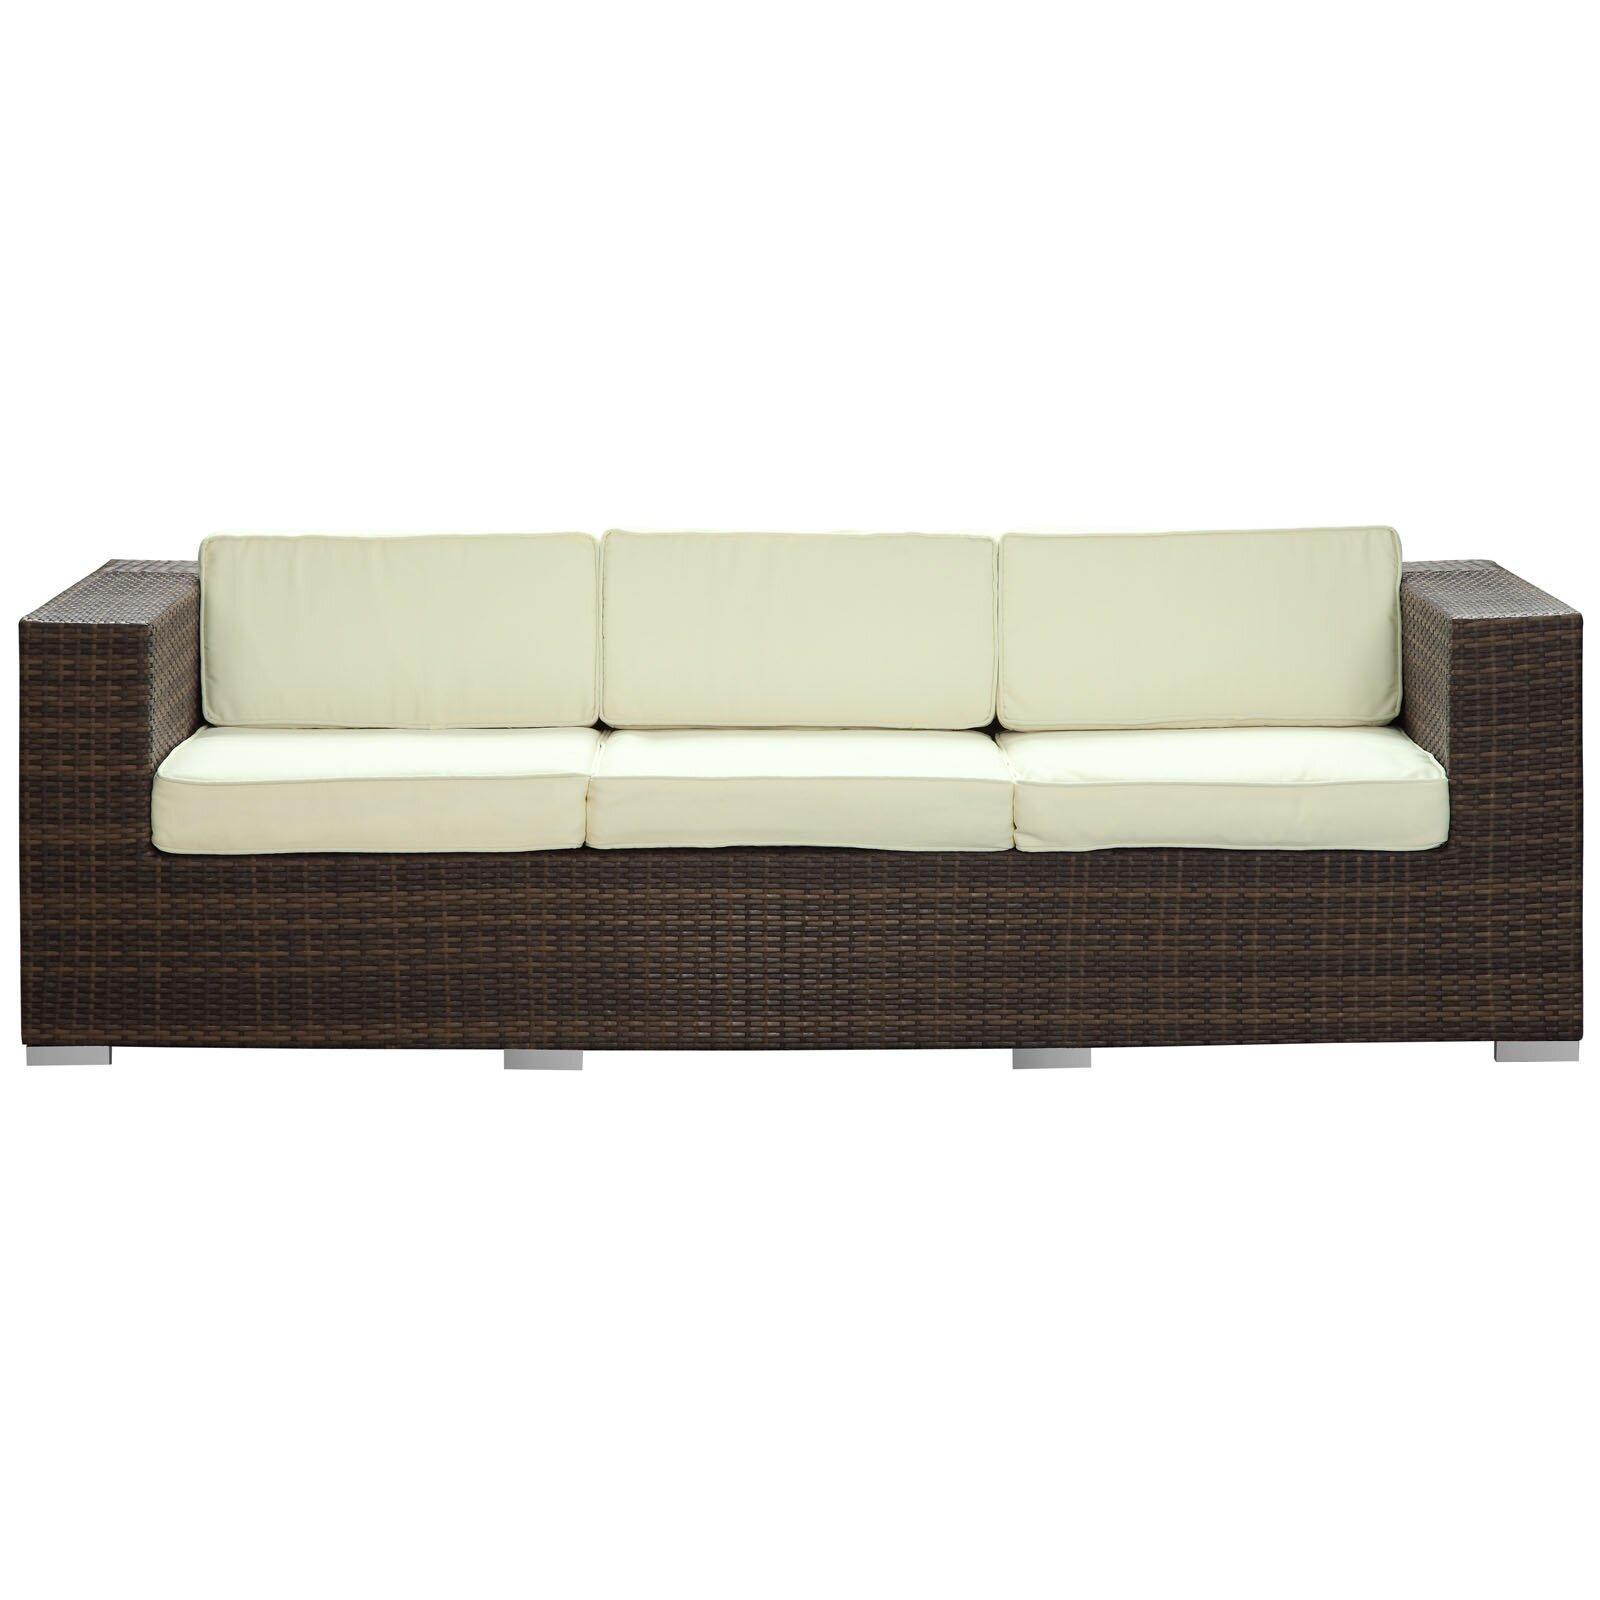 Modway Daytona Outdoor Sofa with Cushions & Reviews